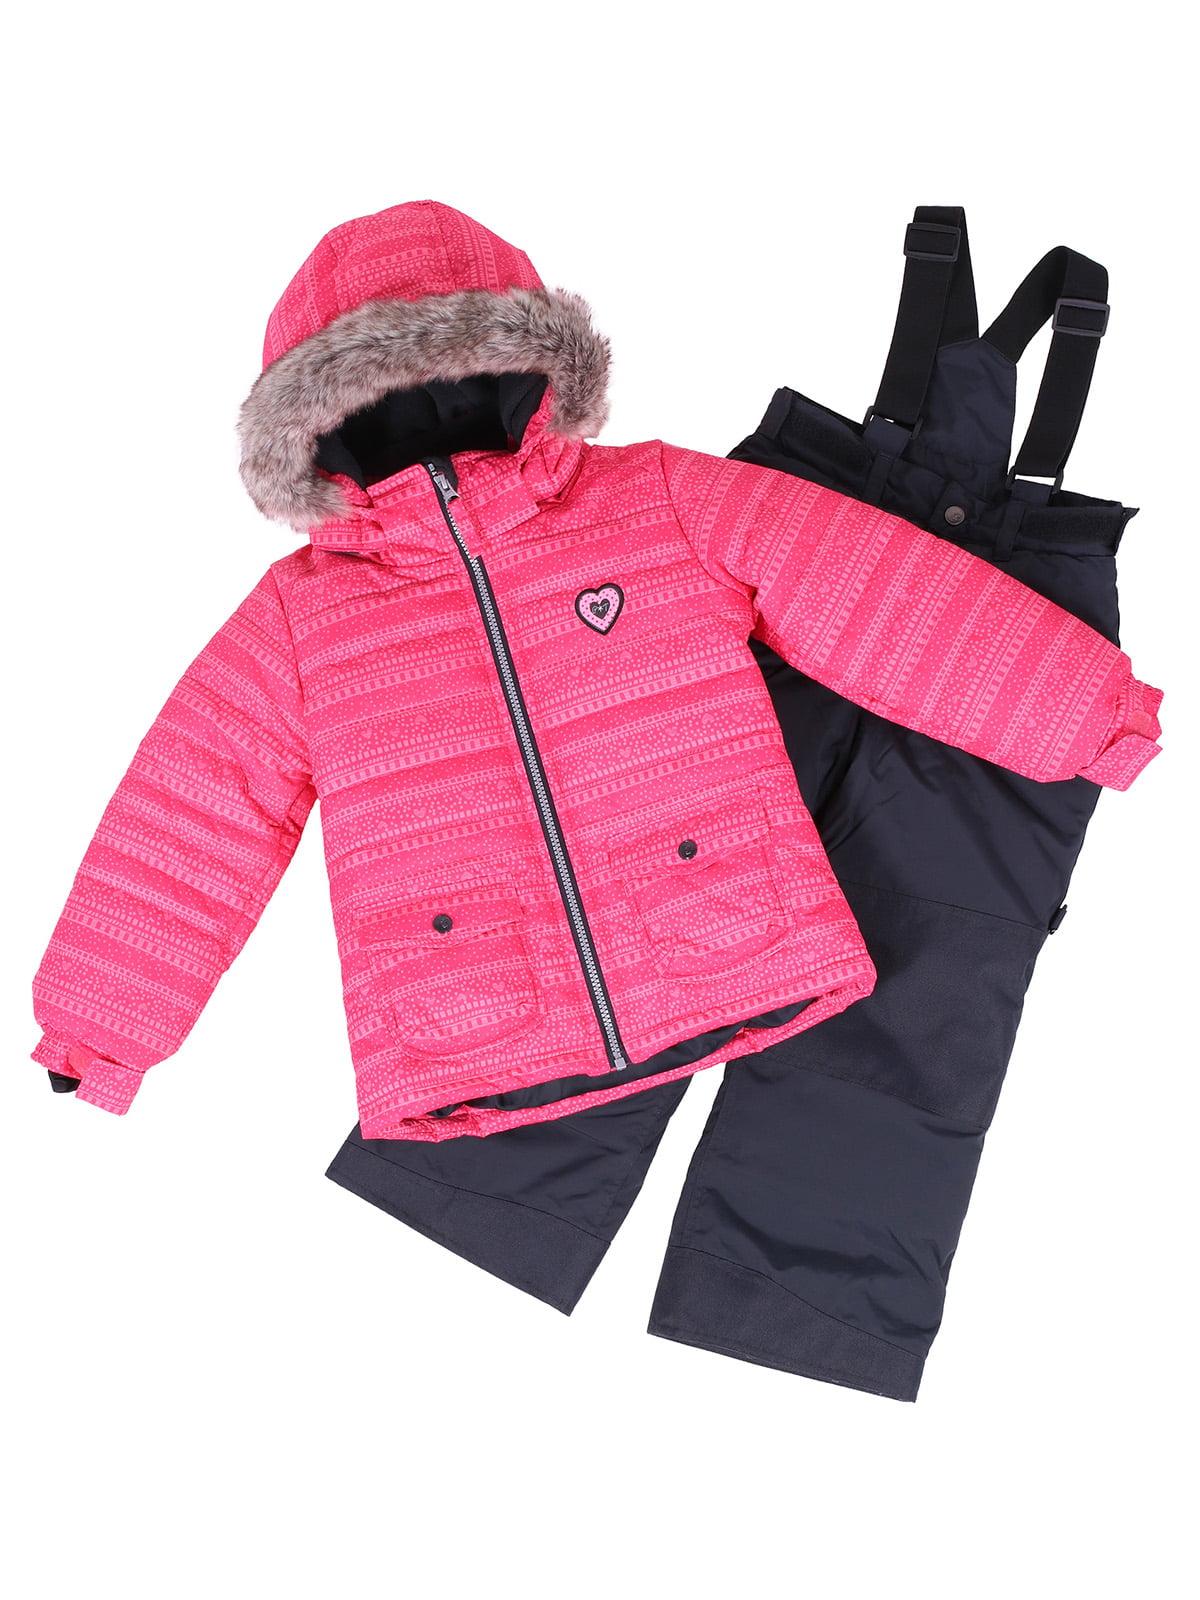 Термокомплект: куртка и полукомбинезон   4781805   фото 2